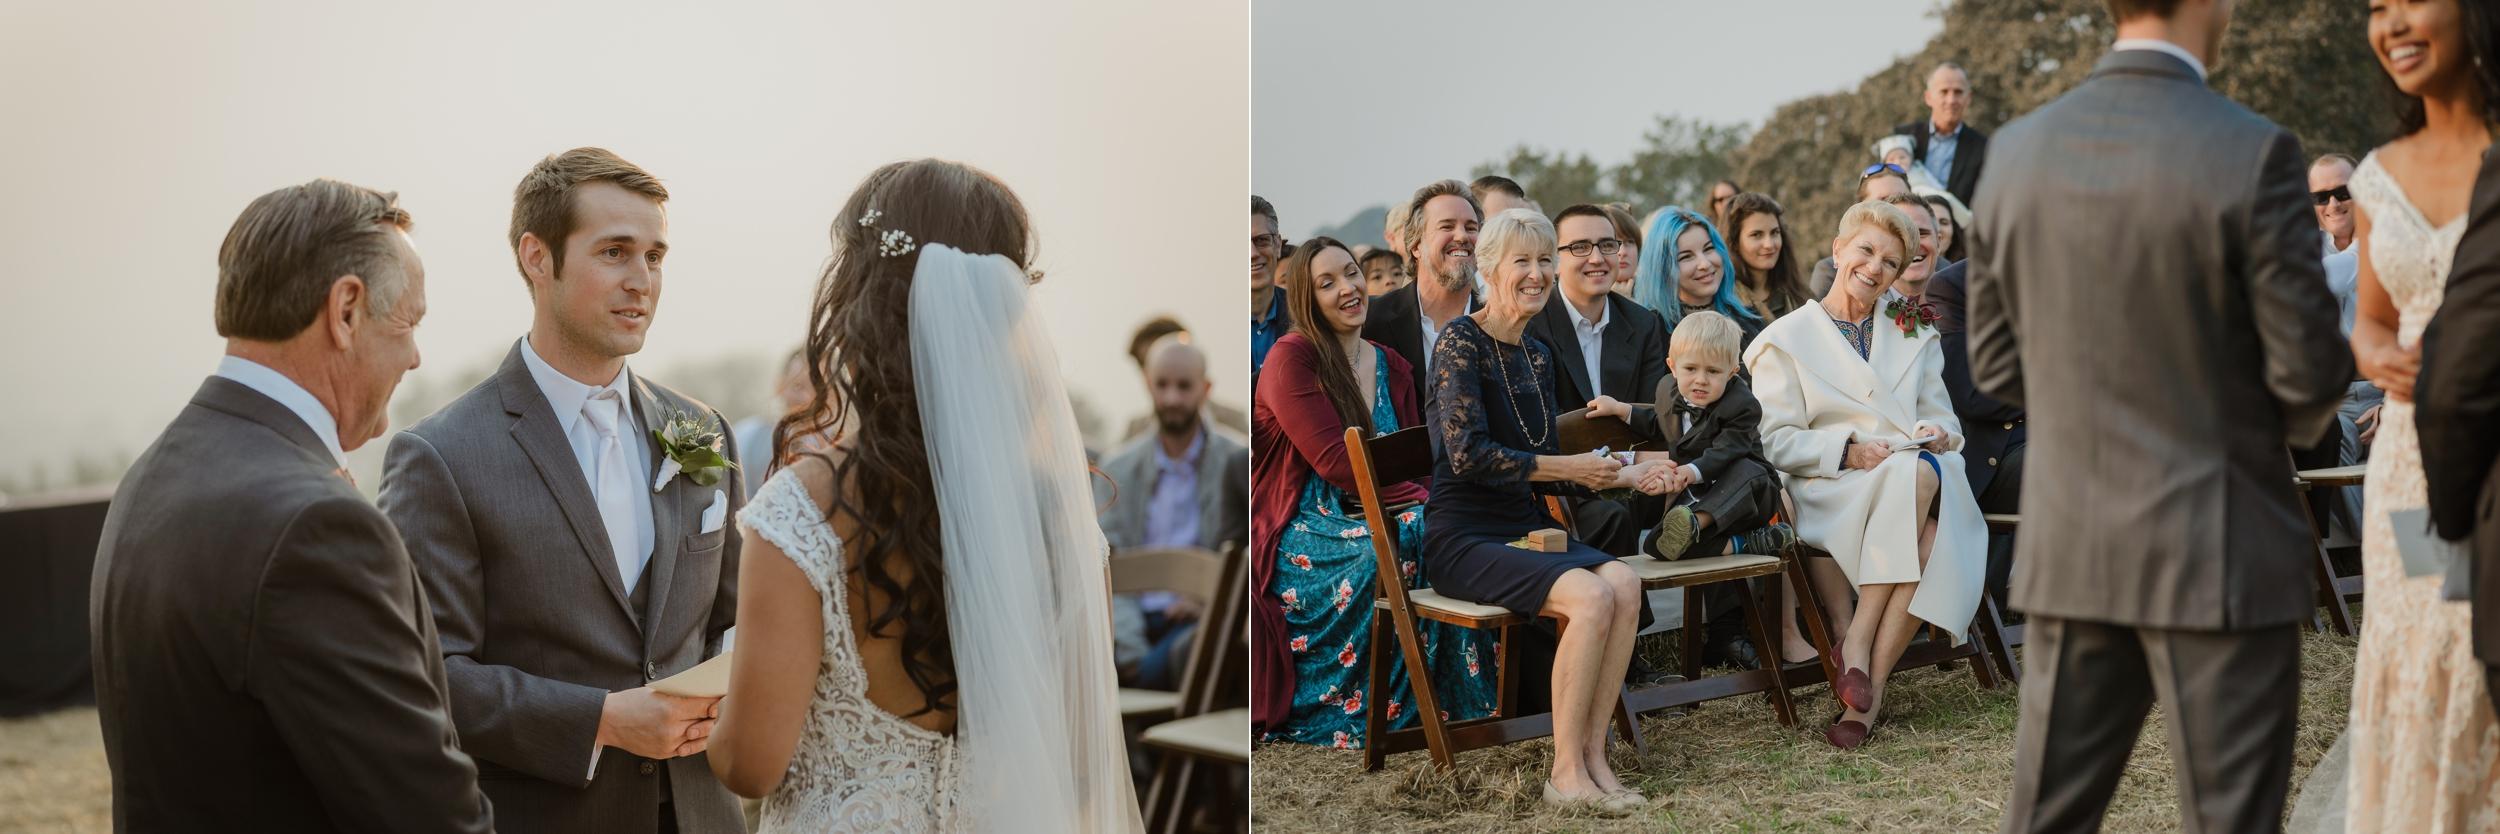 047marin-petaluma-backyard-wedding-vivianchen-310_WEB.jpg